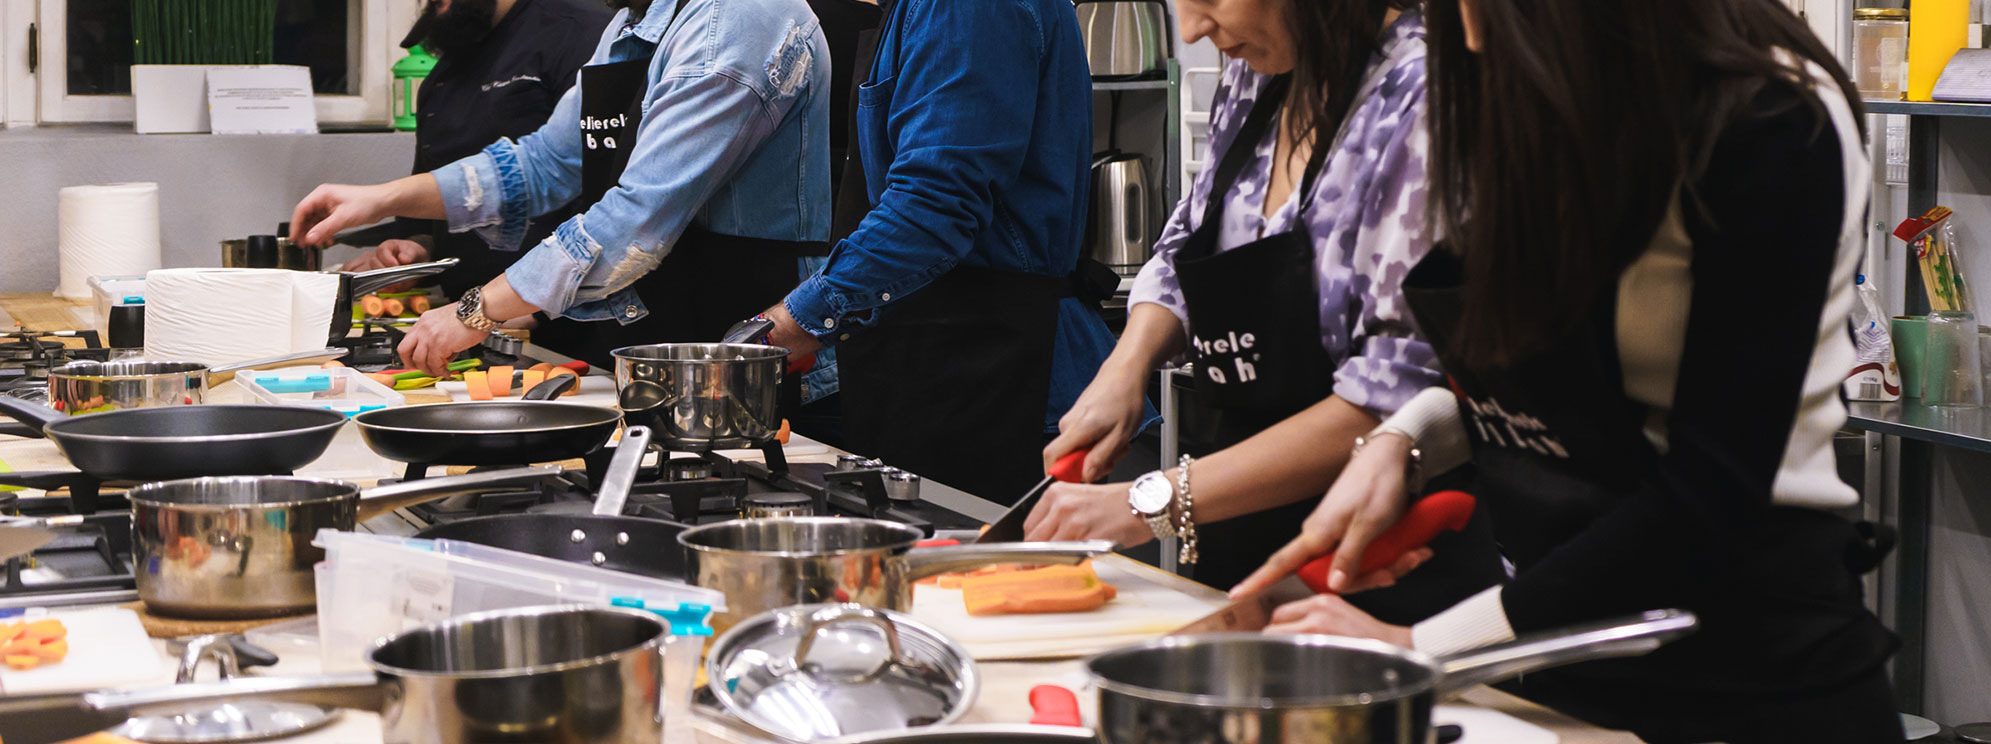 inchiriere-spatiu-evenimente-si-teambuilding-uri-culinare-petreceri-de-gatit-cover